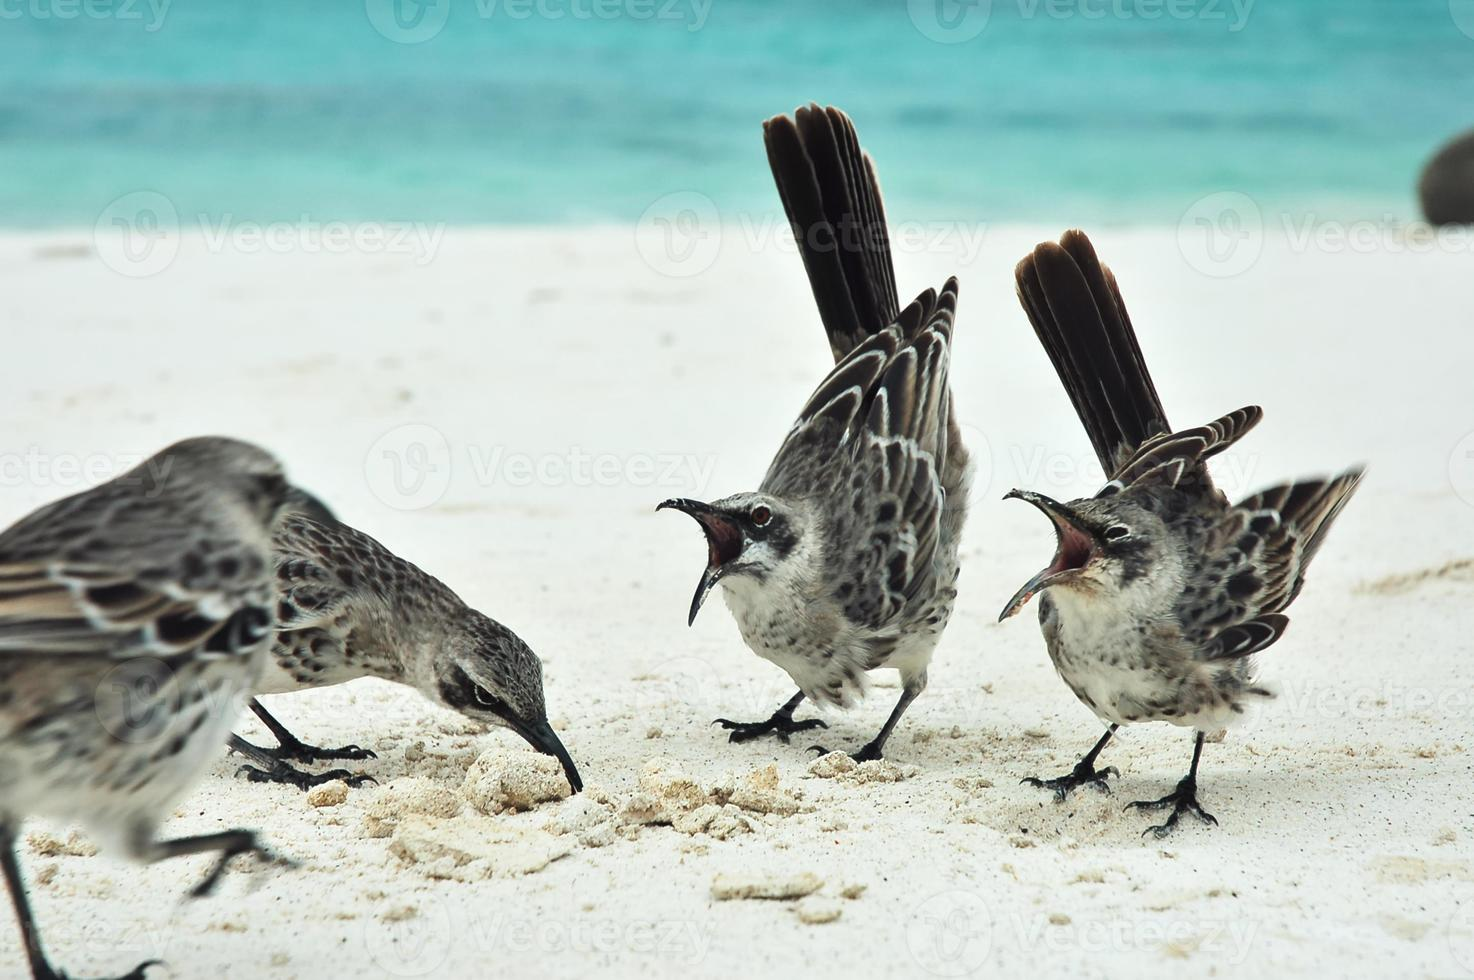 Galapagos-Spottdrossel. foto